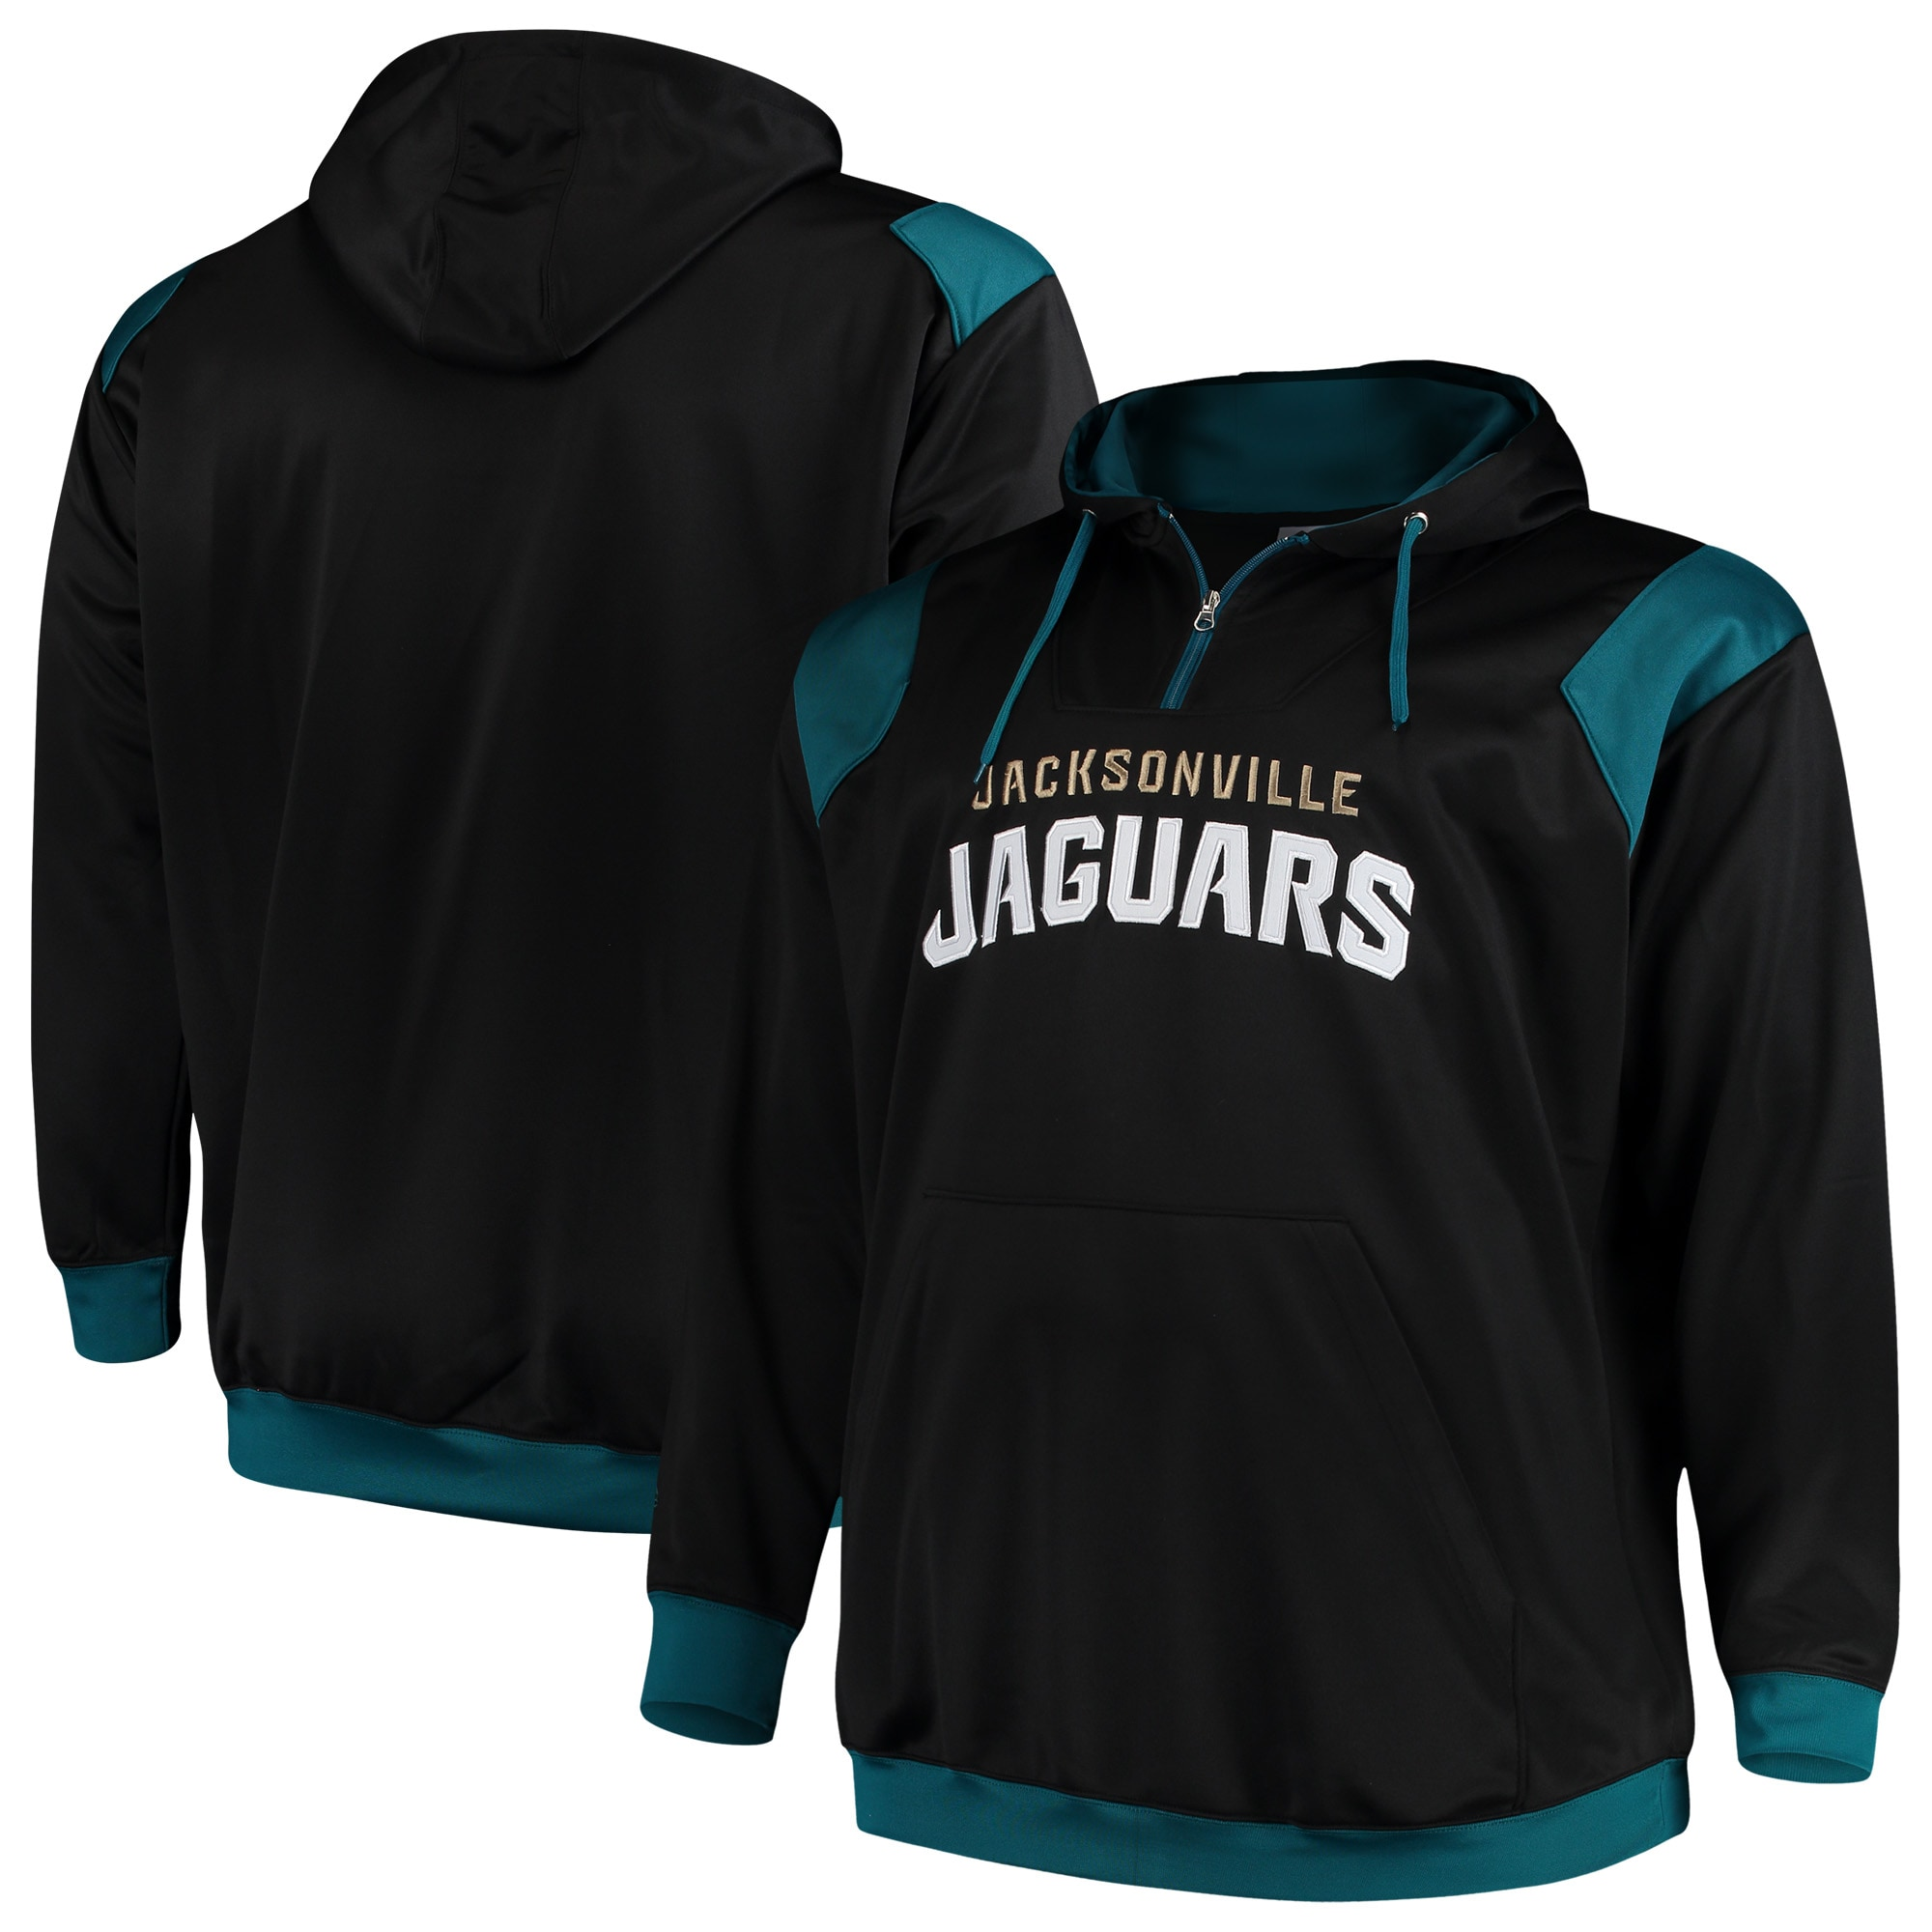 Jacksonville Jaguars Majestic Big & Tall 1/4-Zip Pullover Hoodie - Black